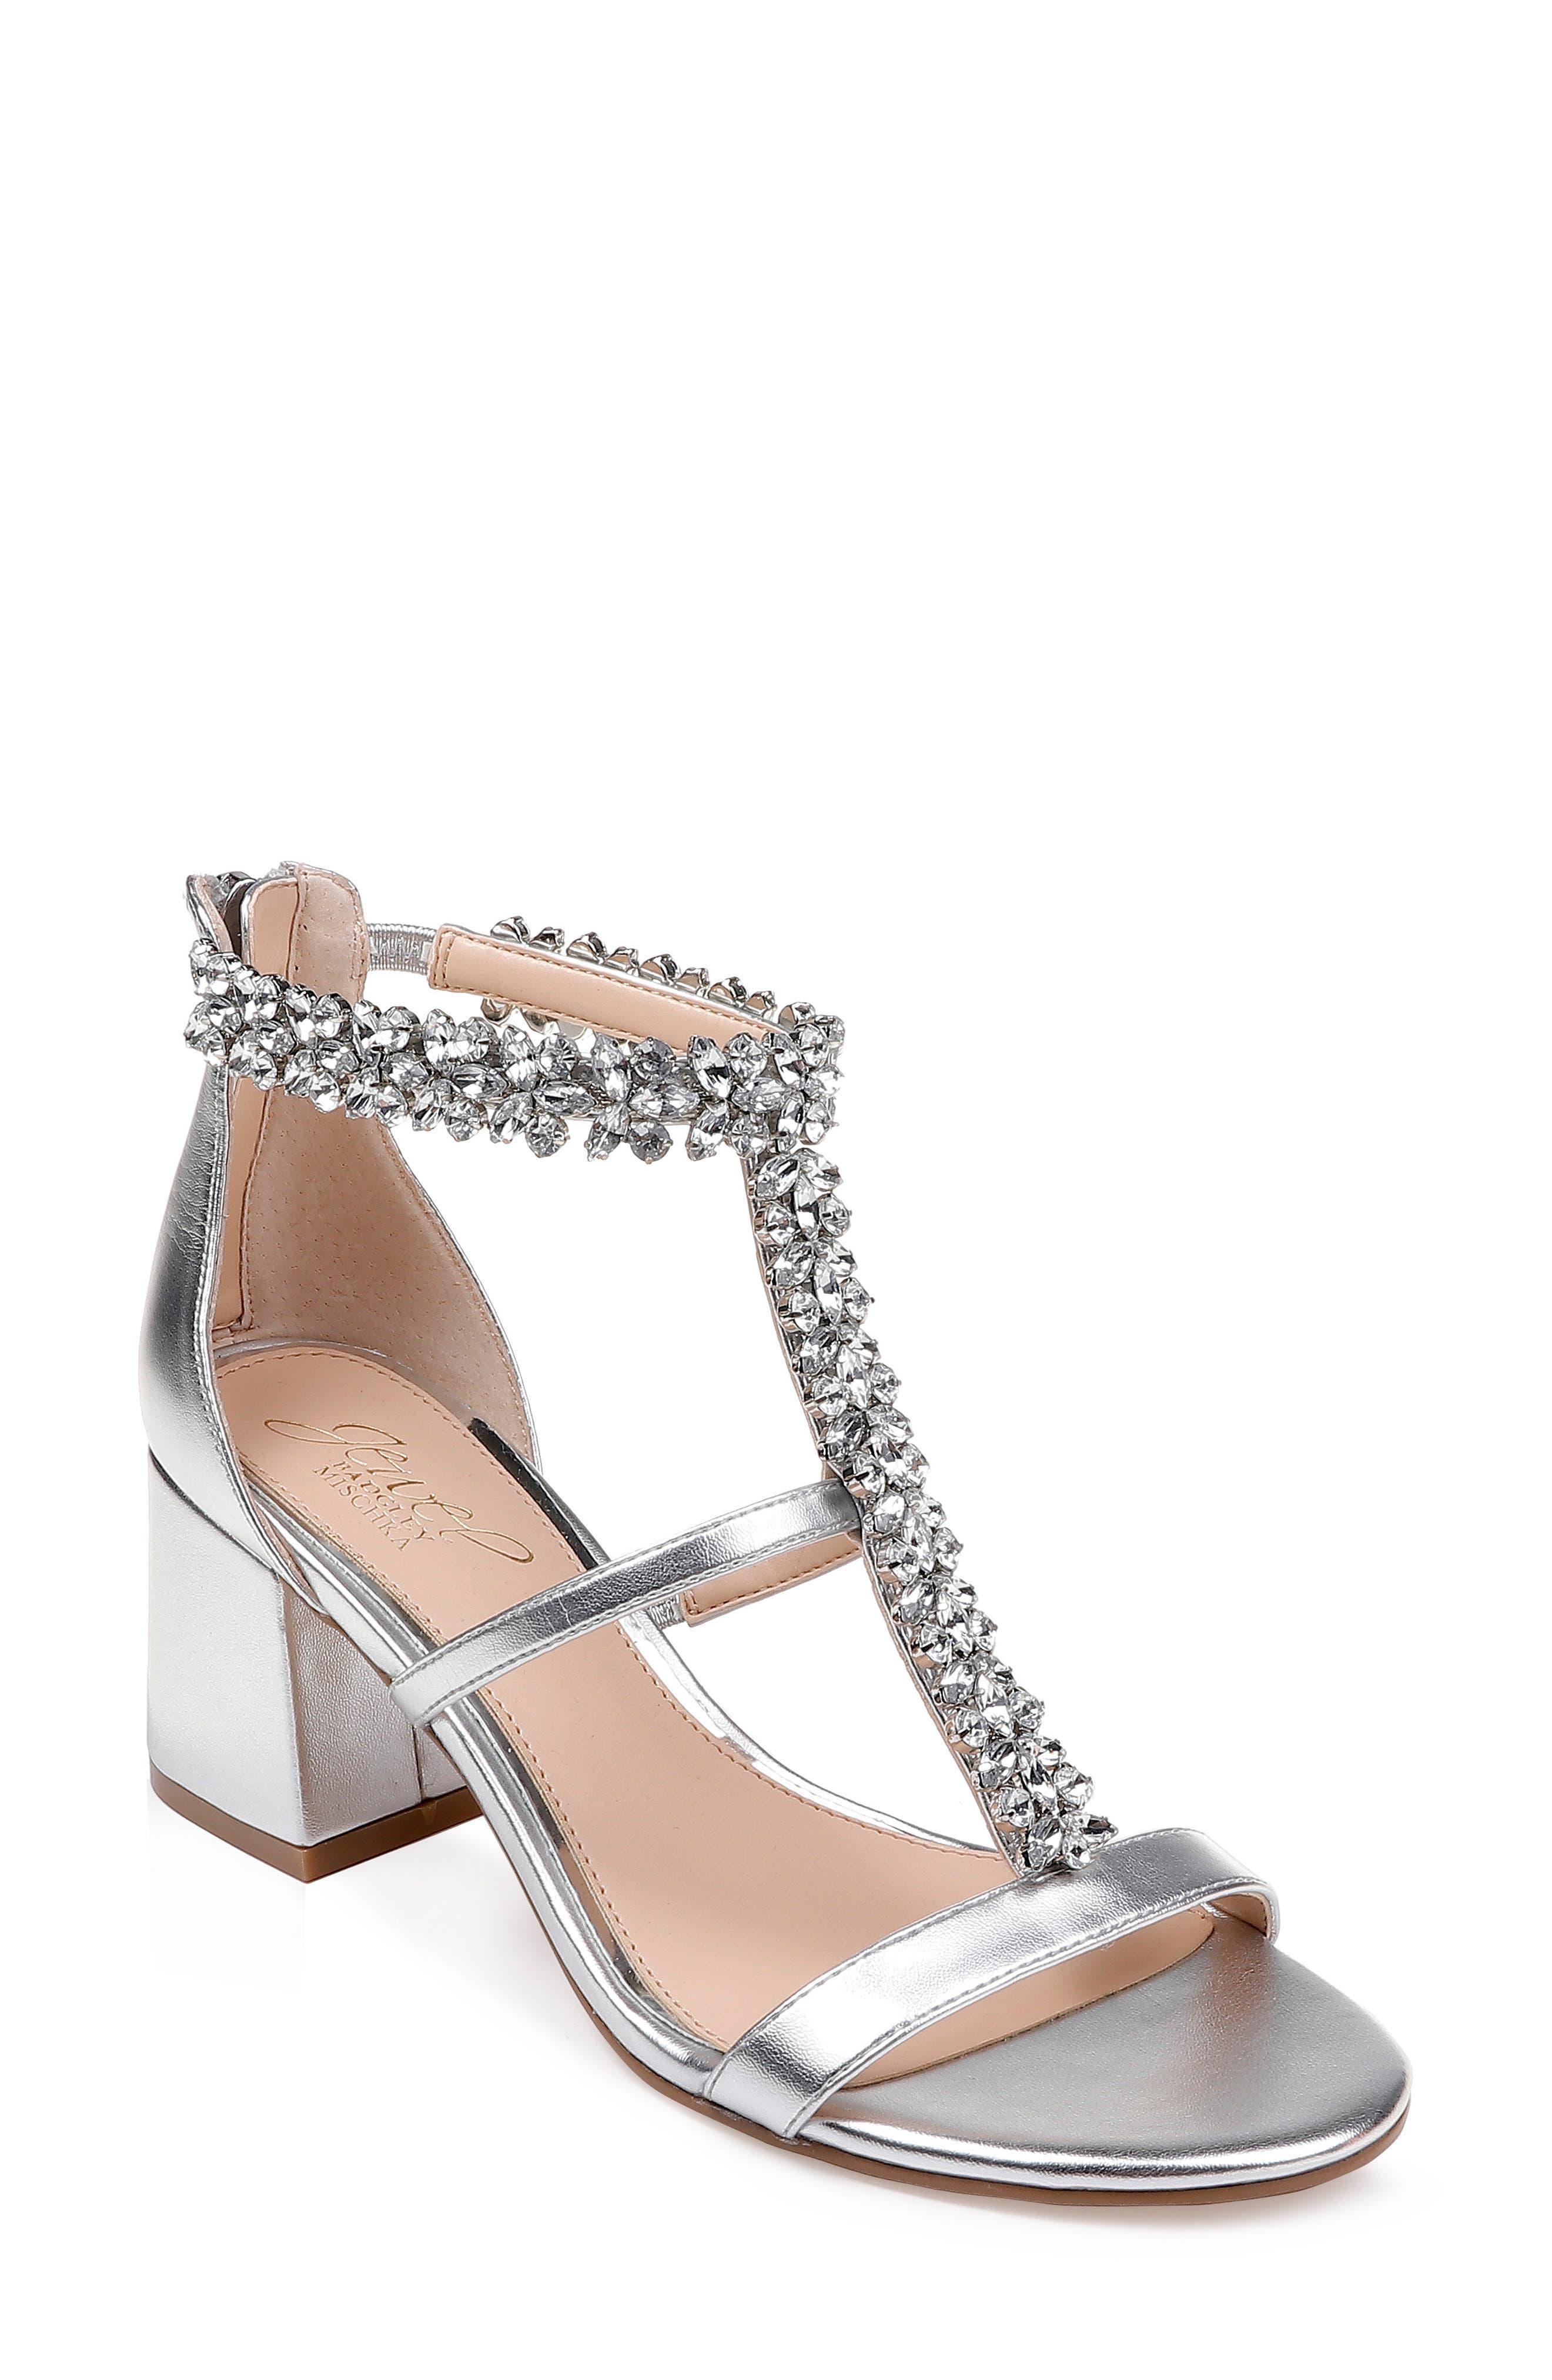 95d9c86cc512 Jewel Badgley Mischka Janica Block Heel Sandal- Metallic